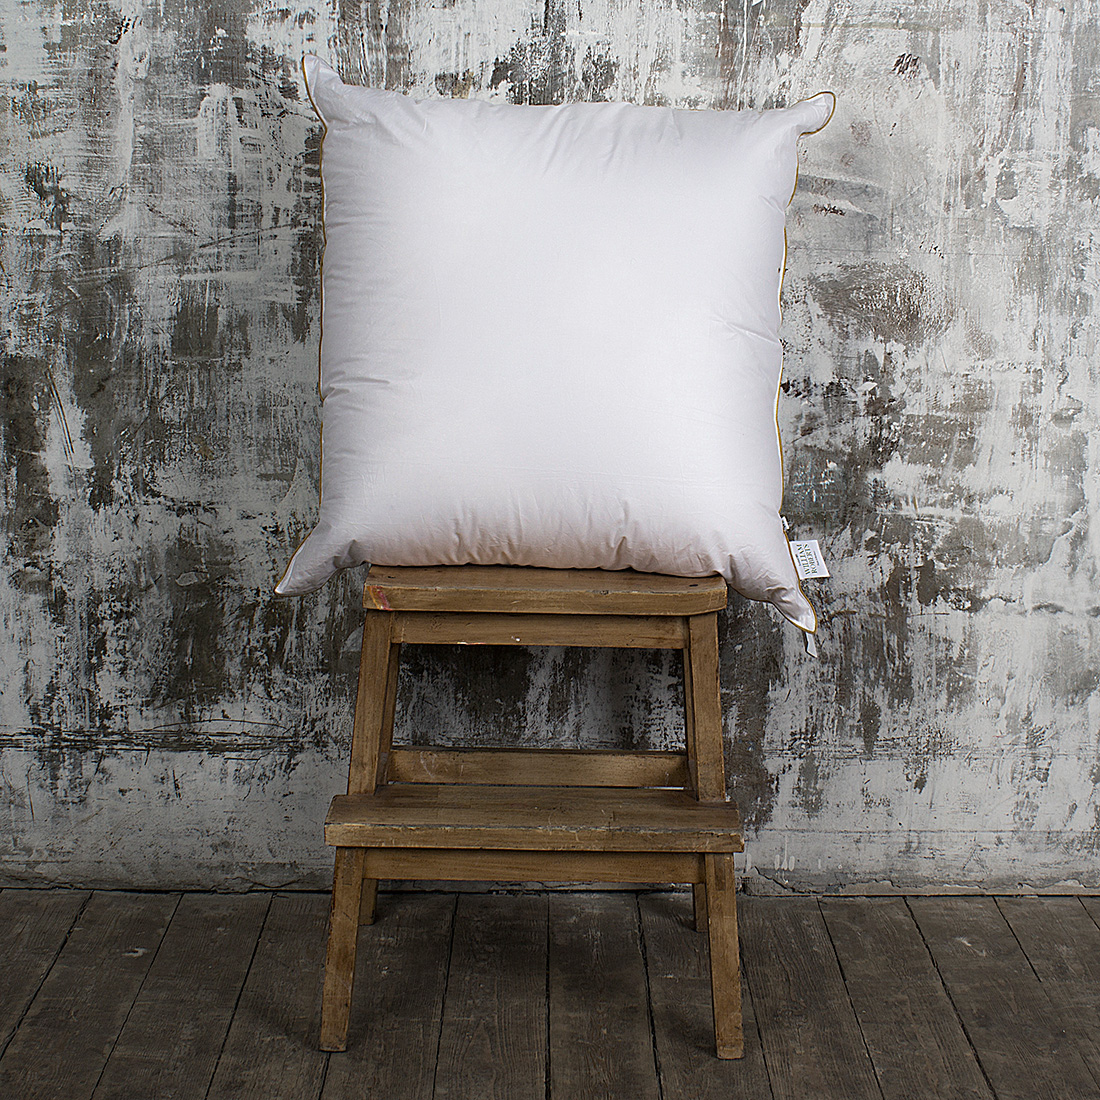 где купить Подушки William Roberts Подушка White Splendid Down Средняя (70х70) по лучшей цене